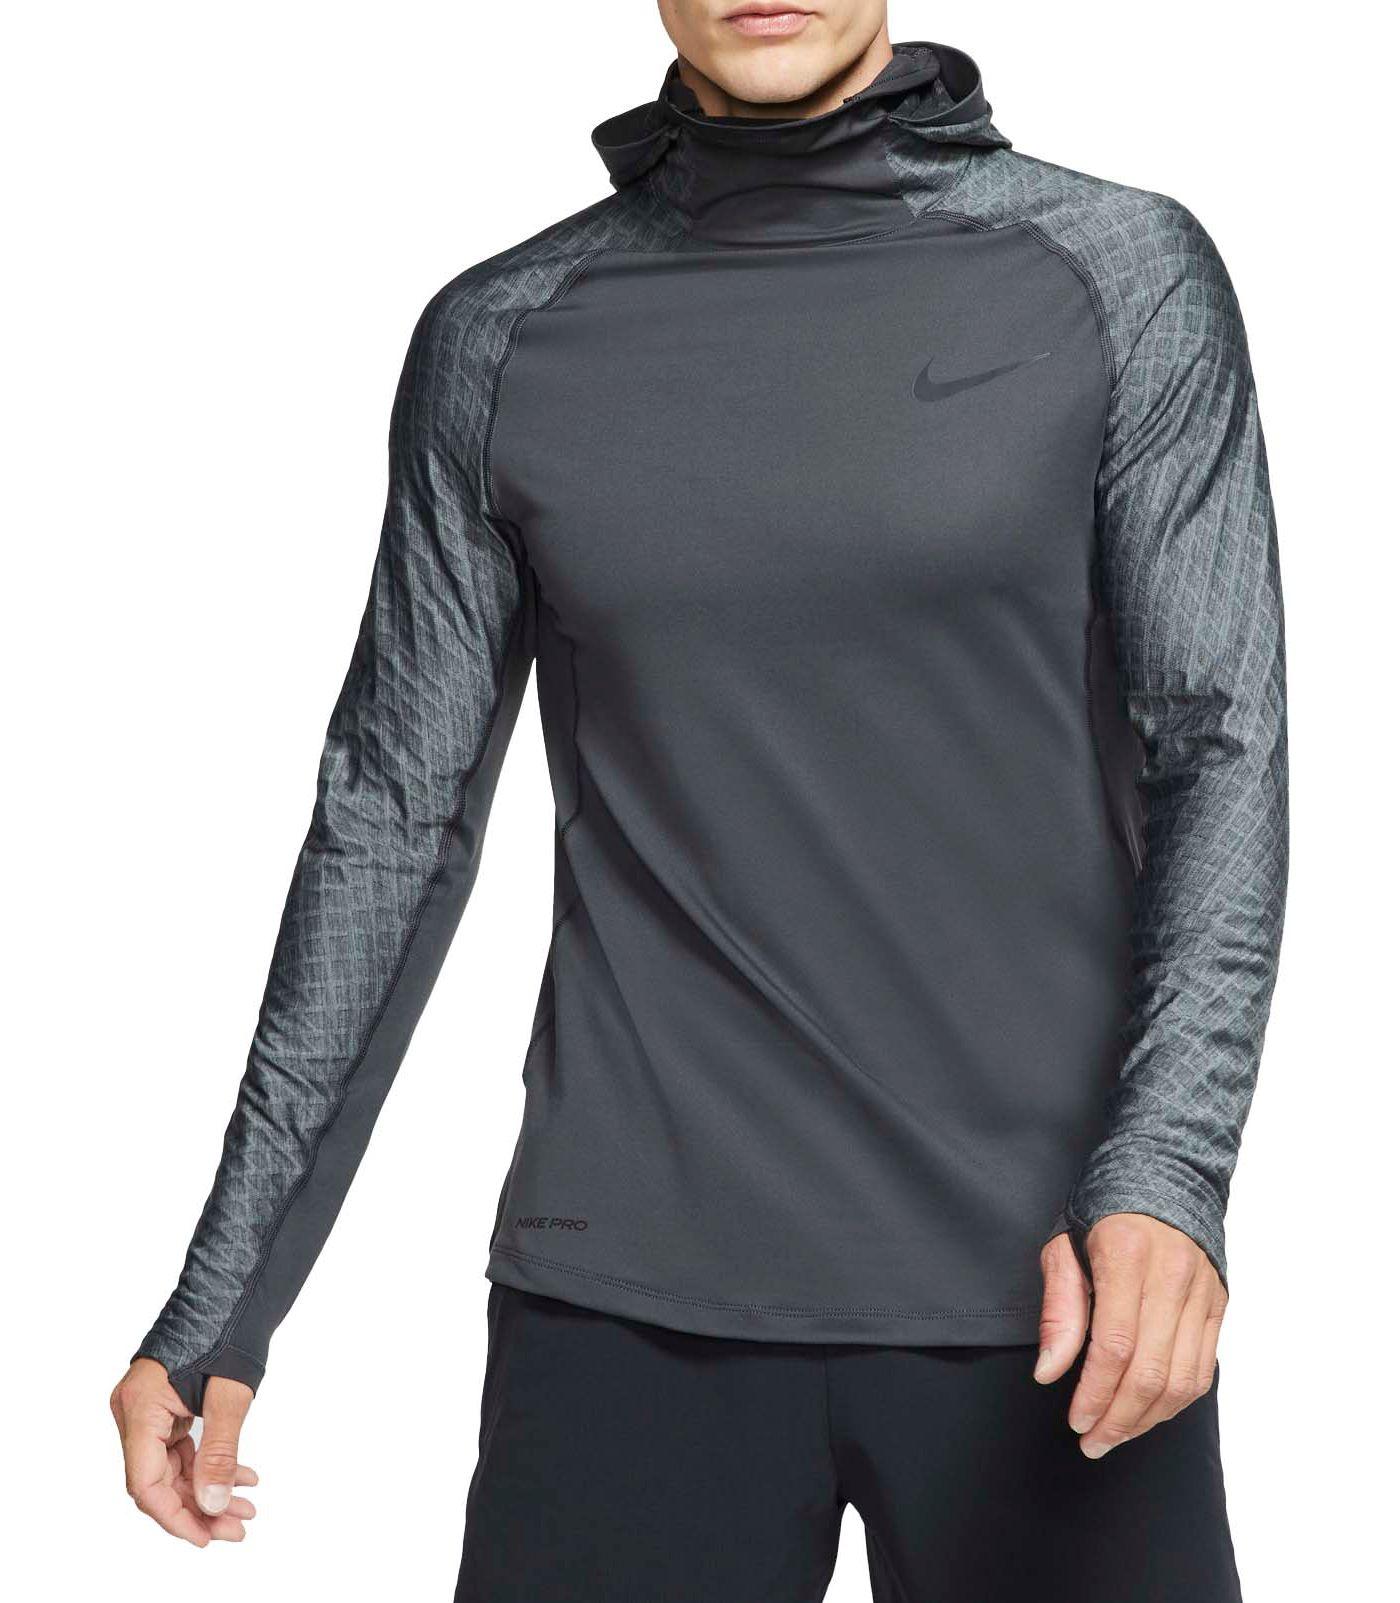 Nike Men's Pro Utility Therma Long Sleeve Shirt